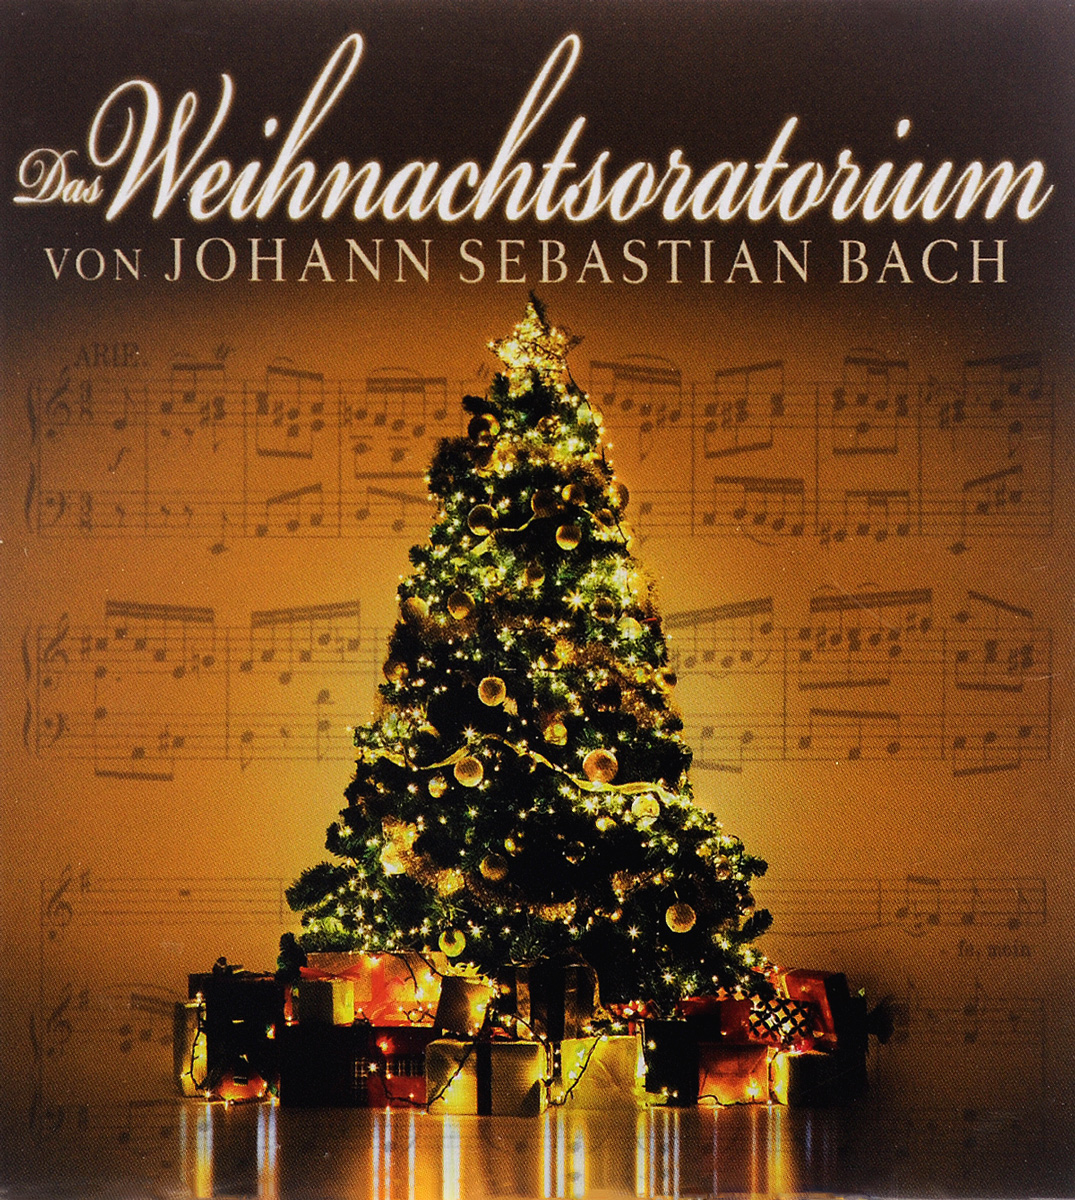 Johann Sebastian Bach. Das Weihnachtsoratorium Von Johann Sebastian Bach stefan hussong johann sebastian bach goldberg variations